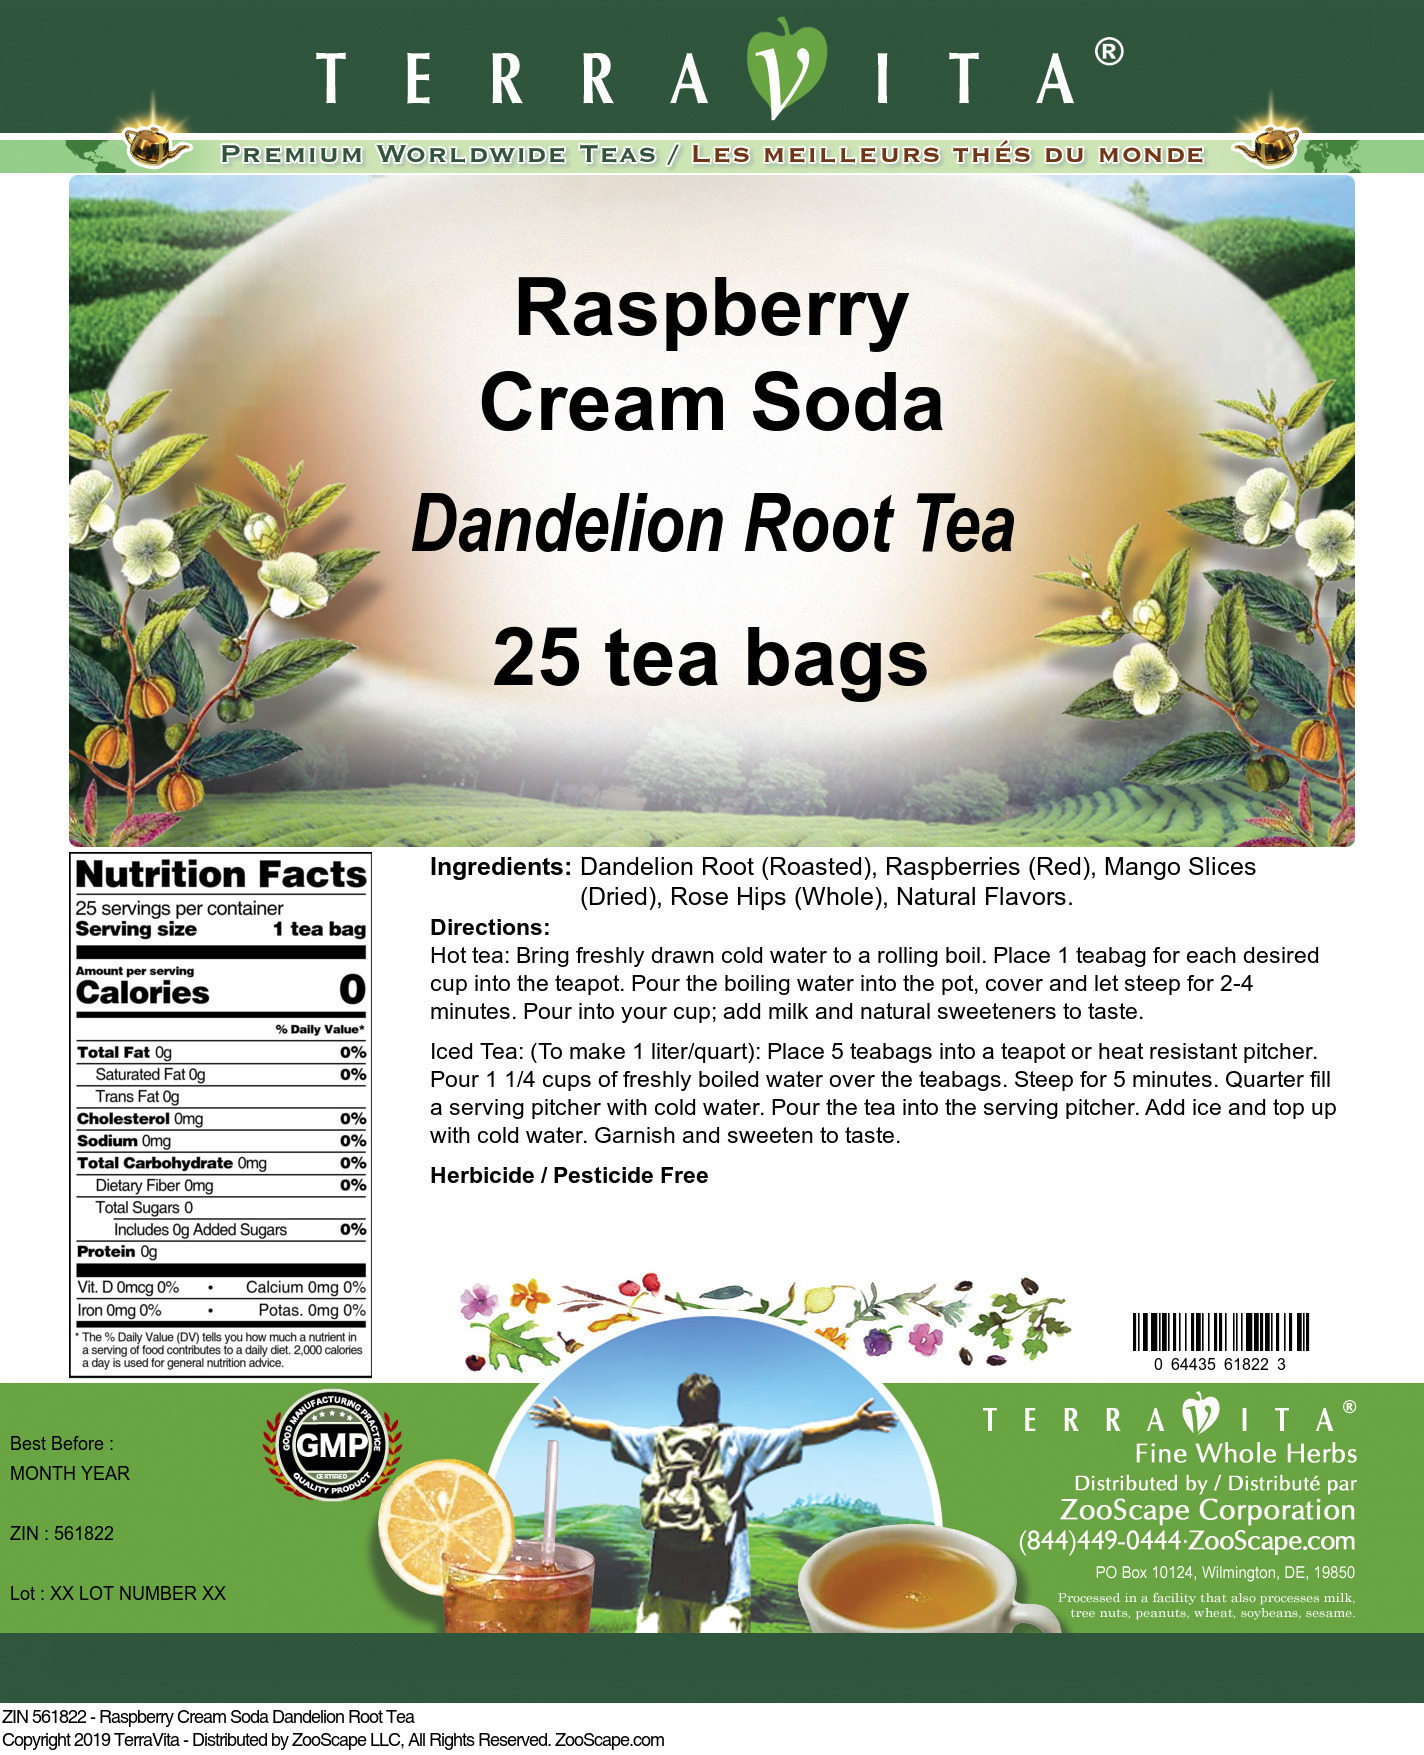 Raspberry Cream Soda Dandelion Root Tea